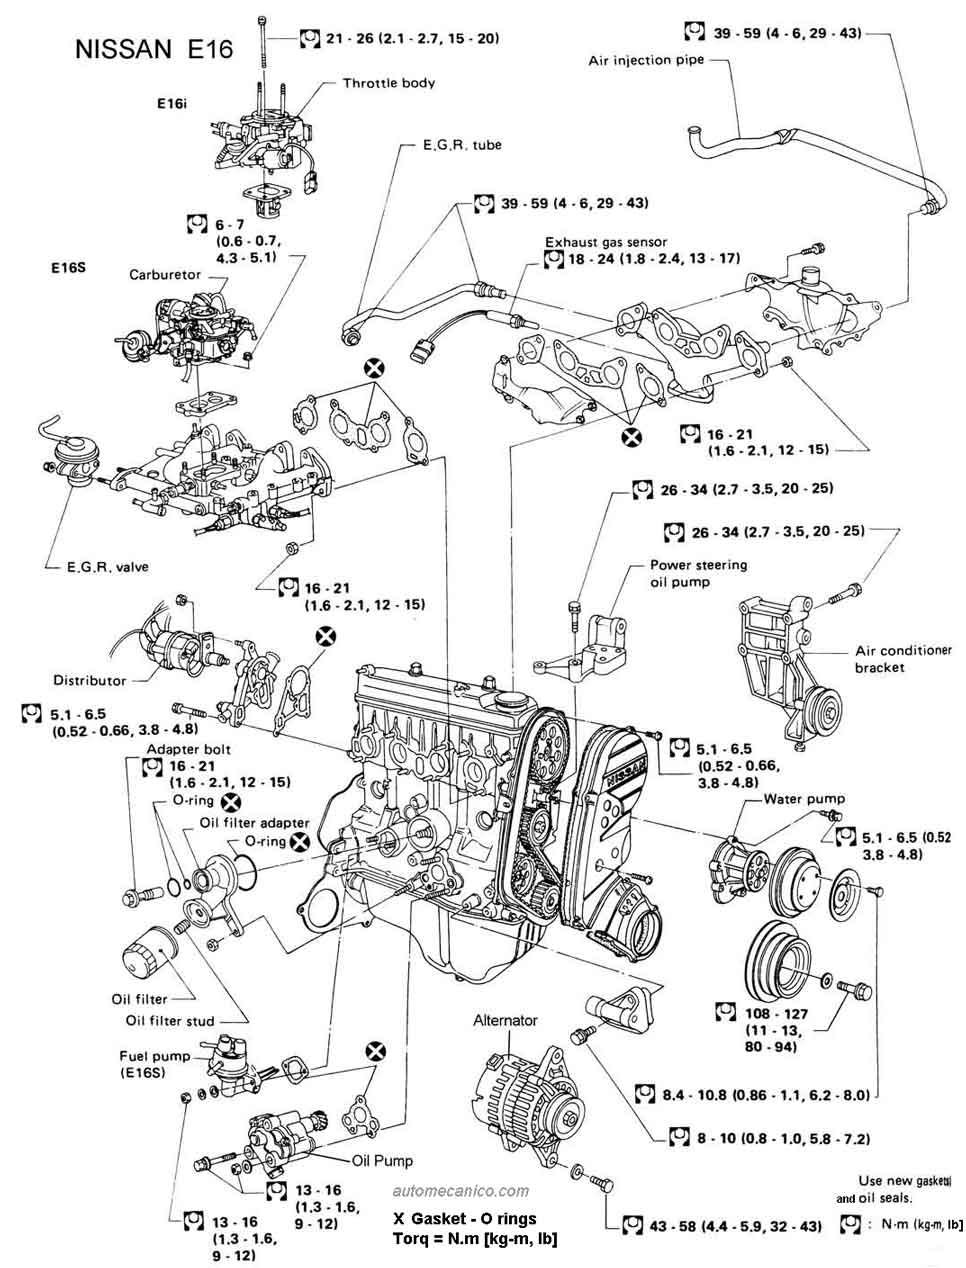 cadillac catera 3 0 engine diagram  cadillac  auto wiring diagram